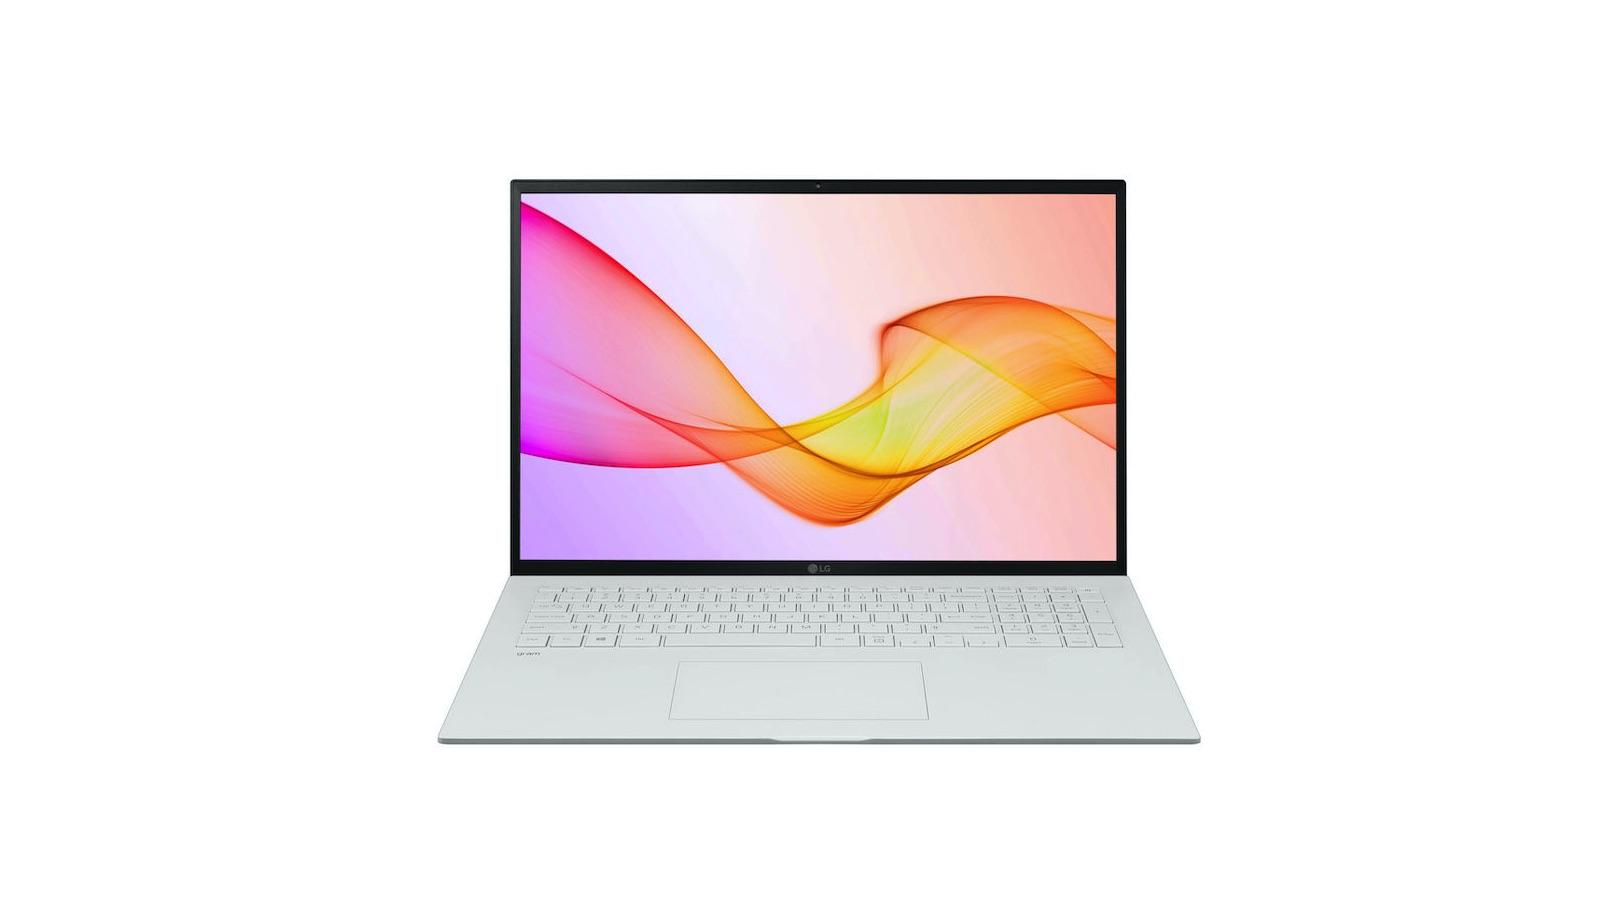 LG 2021 gram laptops have an impressive 16:10 aspect ratio and a sleek design